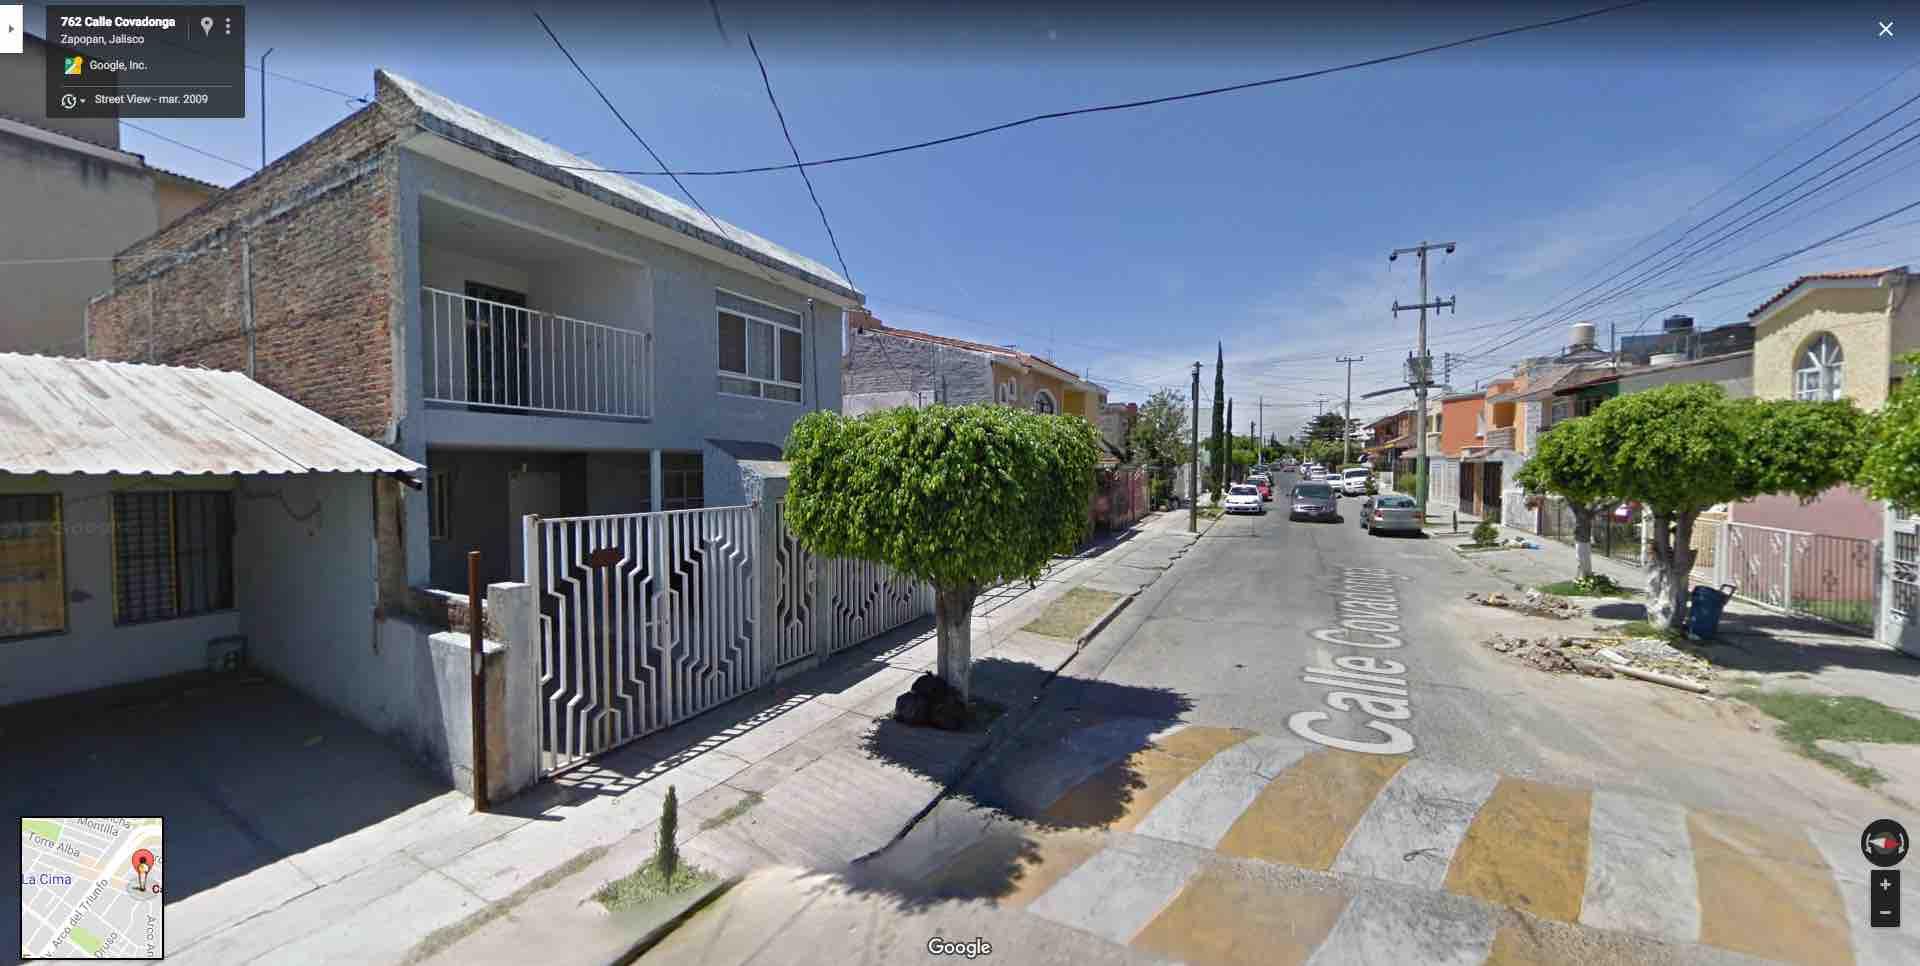 Fracc. Lomas de Zapopan, Calle Covadonga 803, Zapopan, Jal.